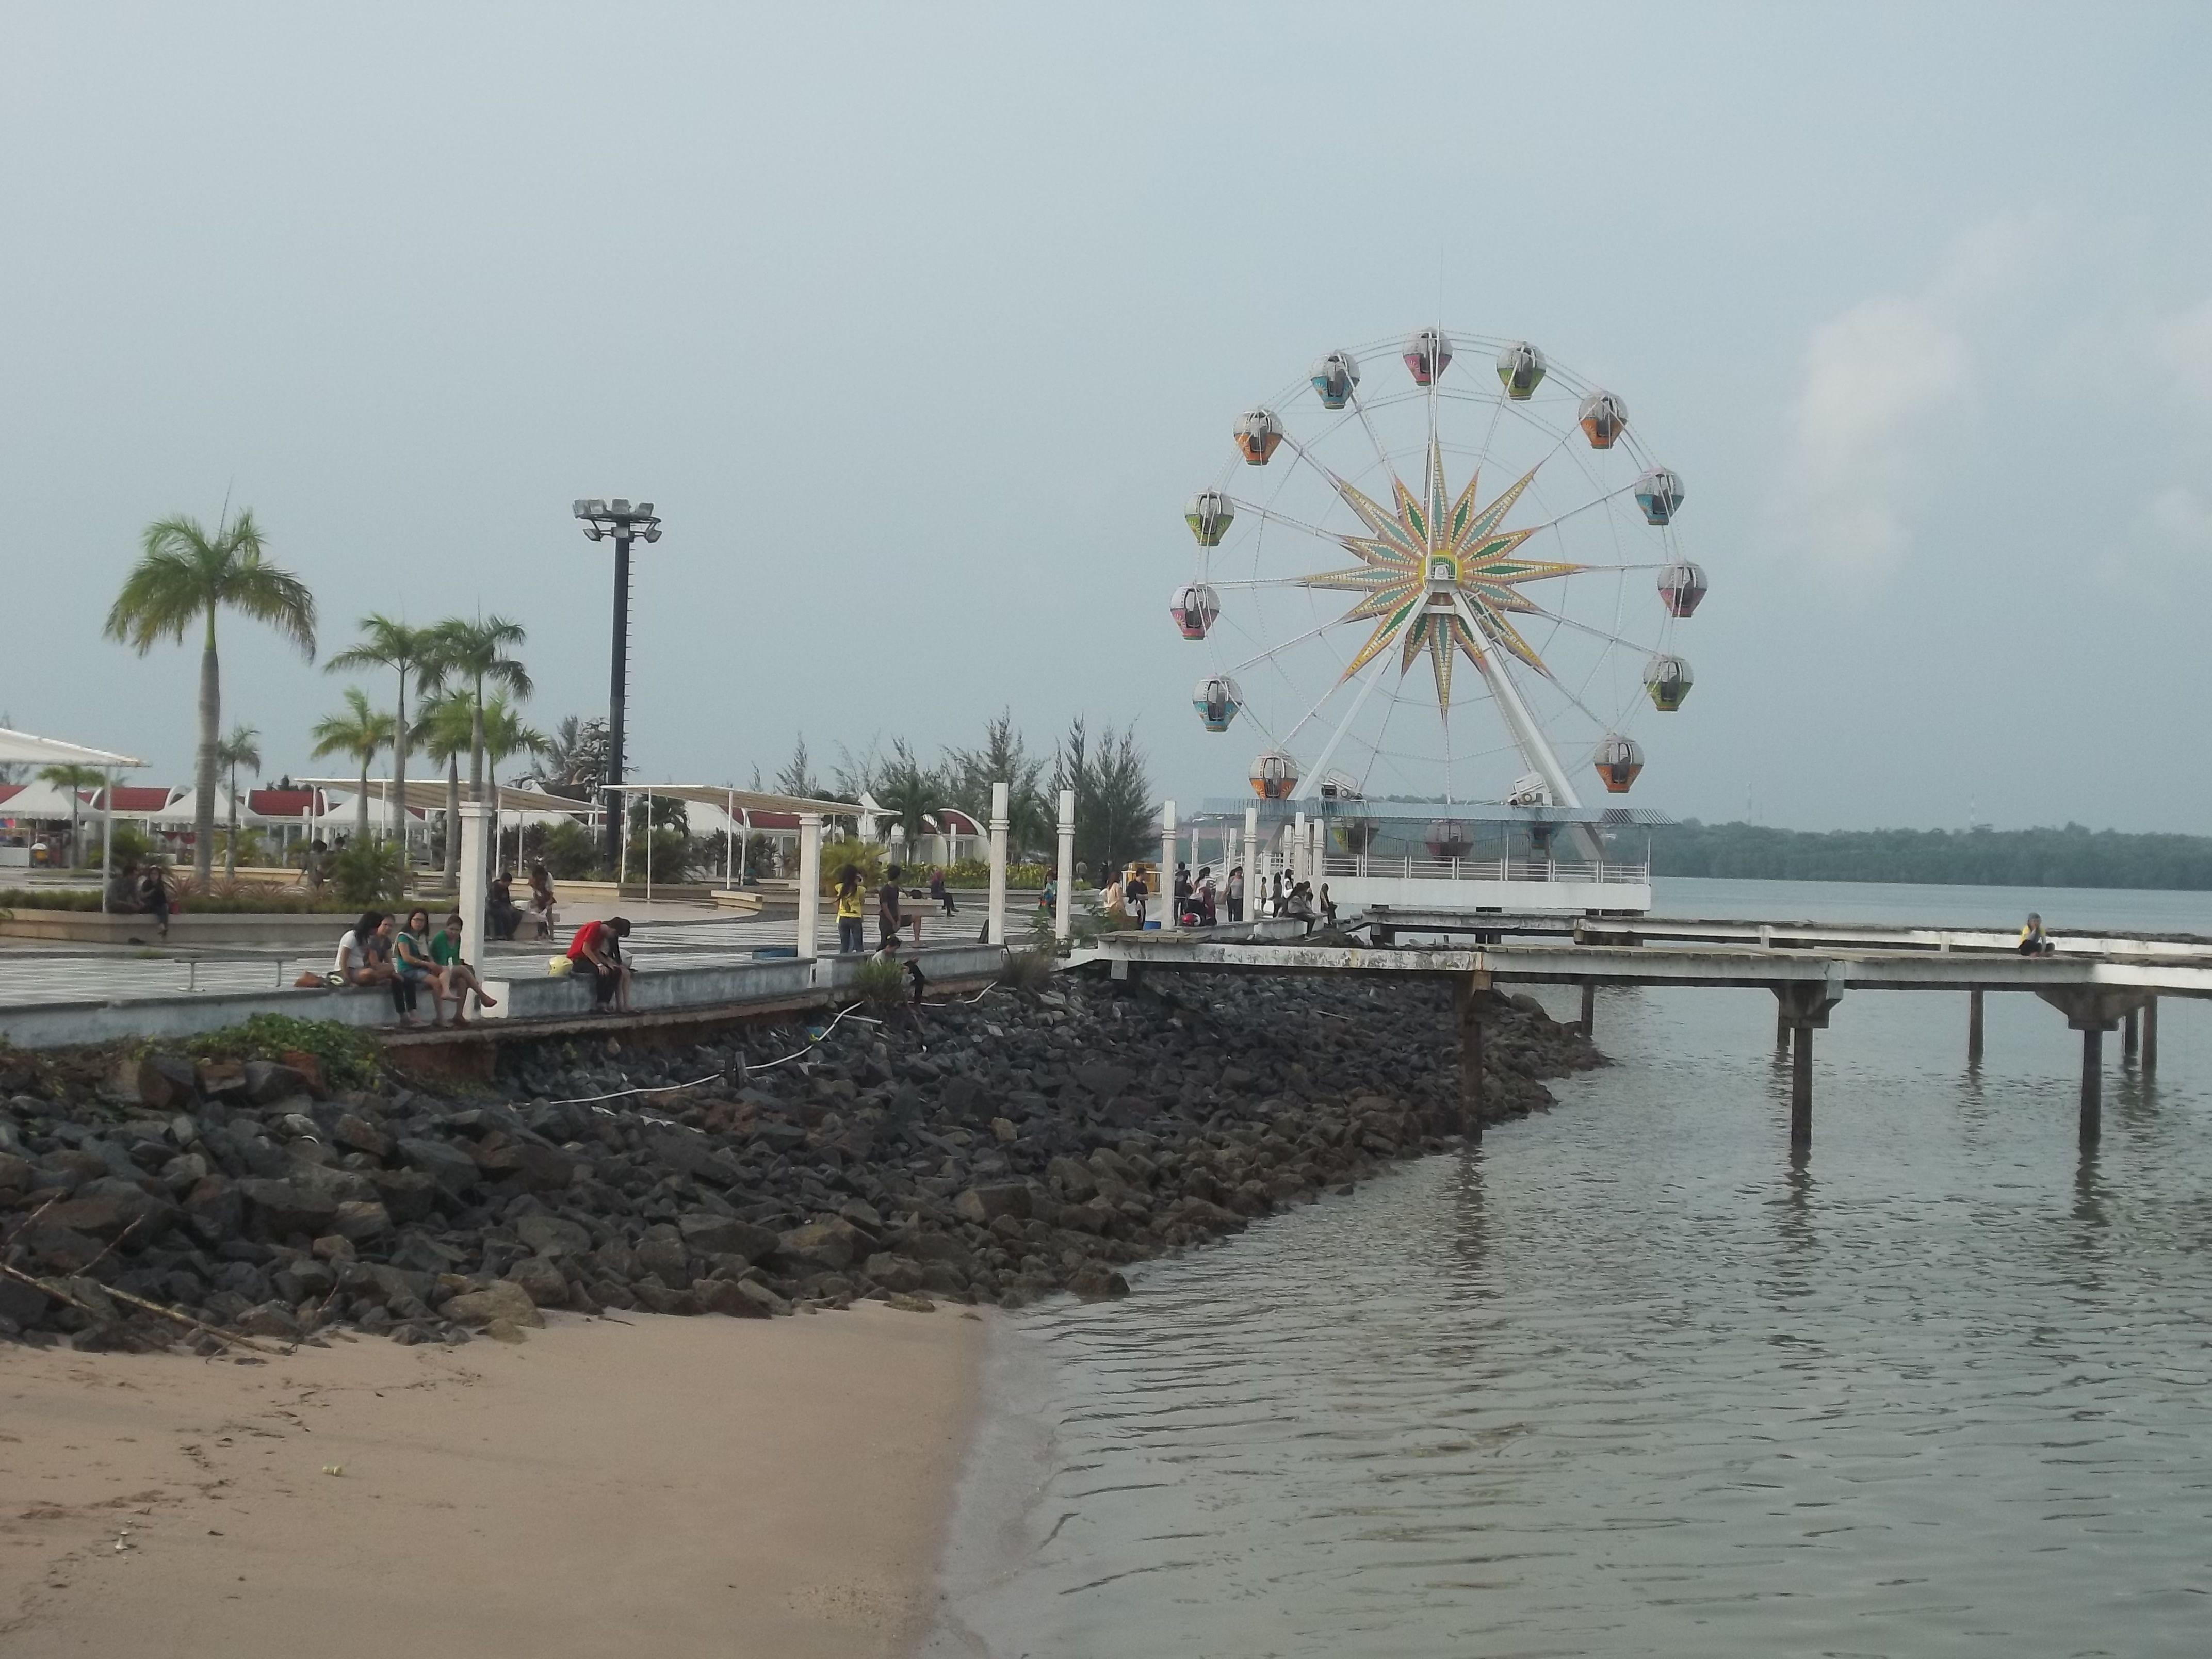 pantai ocarina, Batam, Indonesia Pantai, Indonesia